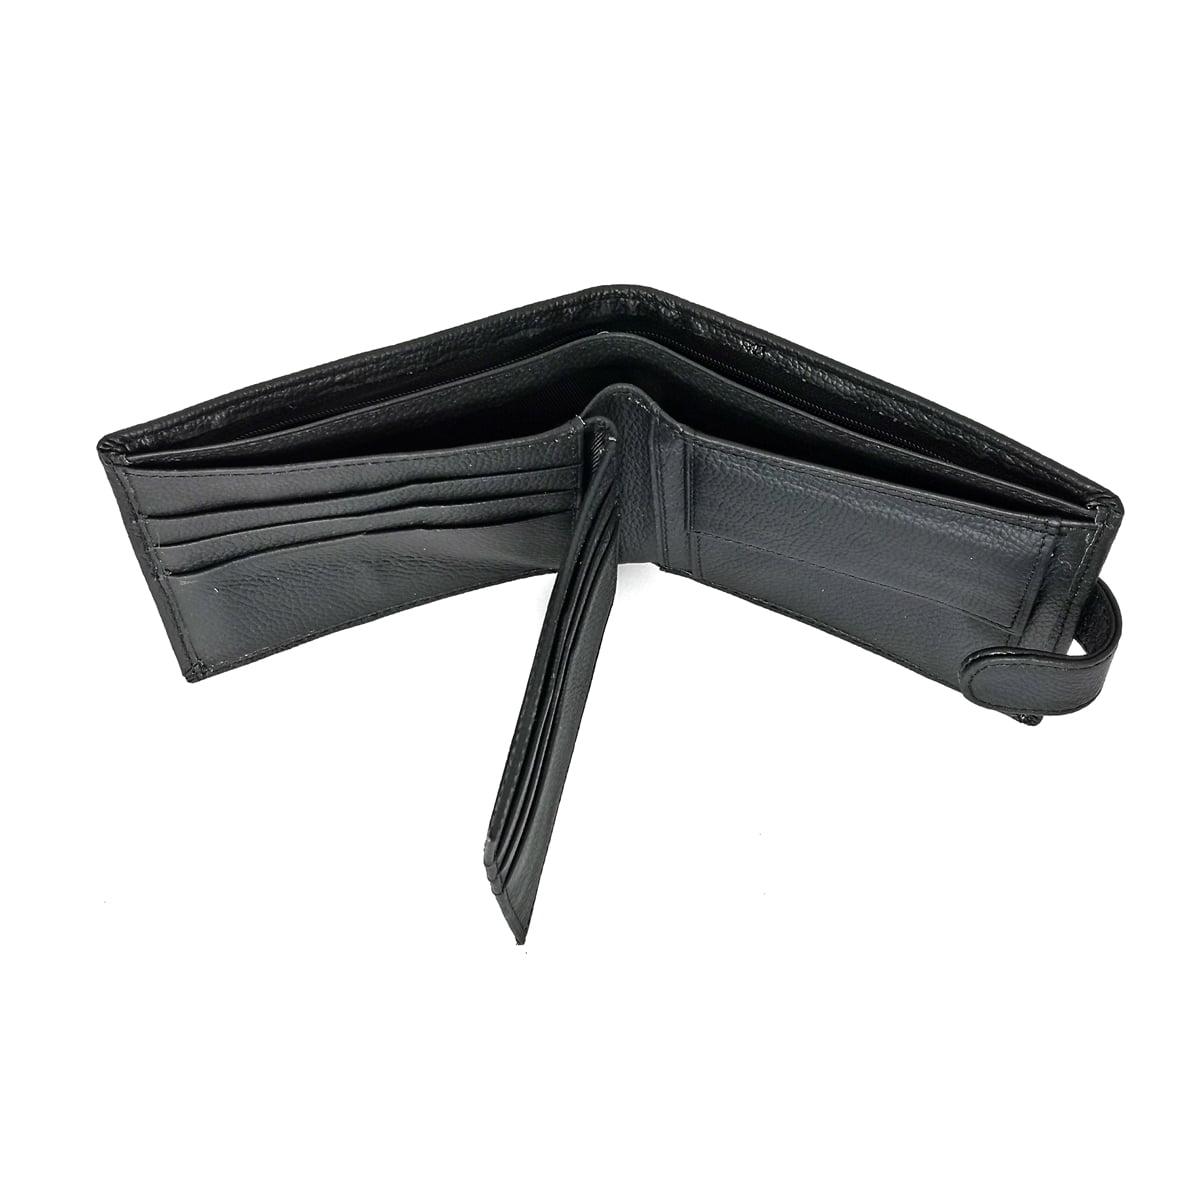 Portofel barbatesc, cu capsa, din piele naturala, negru, 12,5/9,8 cm, Magrot 012